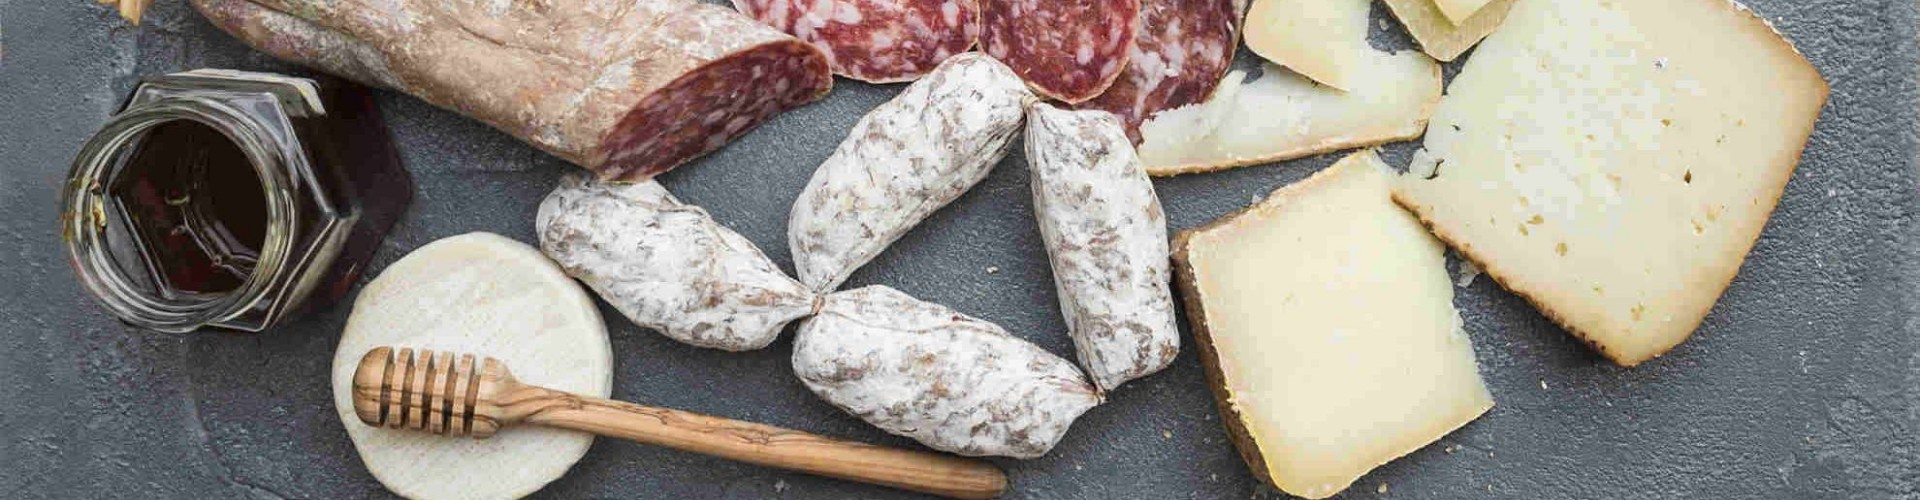 Prodotti naturali valtellinesi su Valtellina Shop